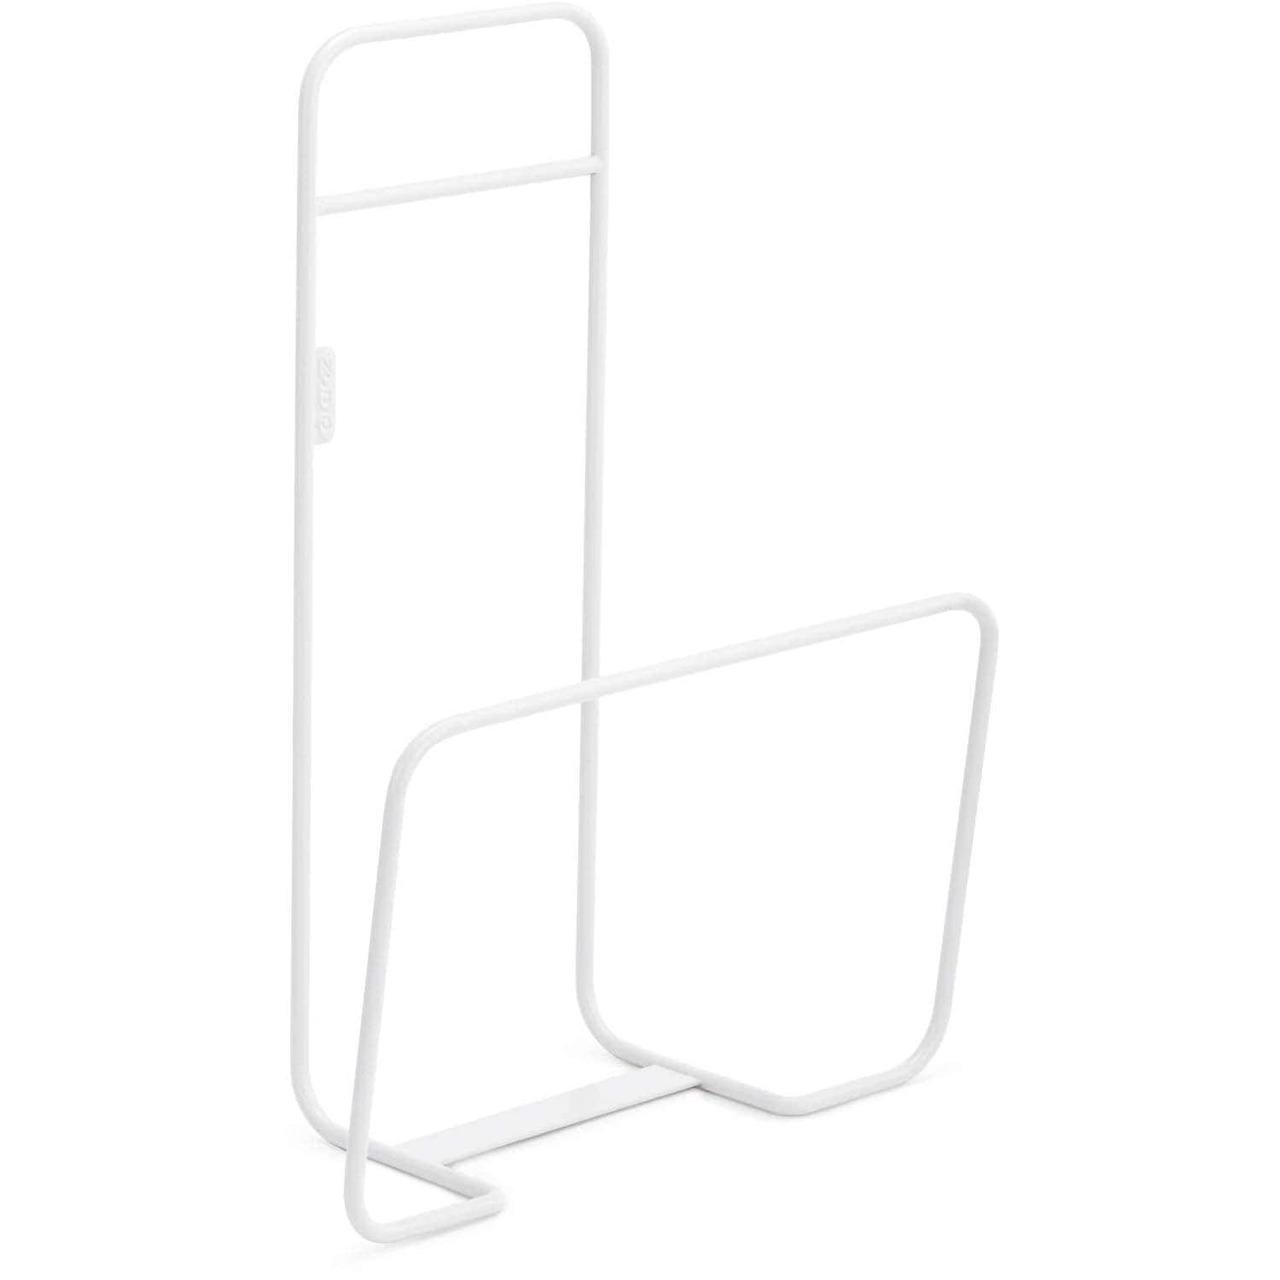 Zomo VS-Rack Wall - bianco 0030103183